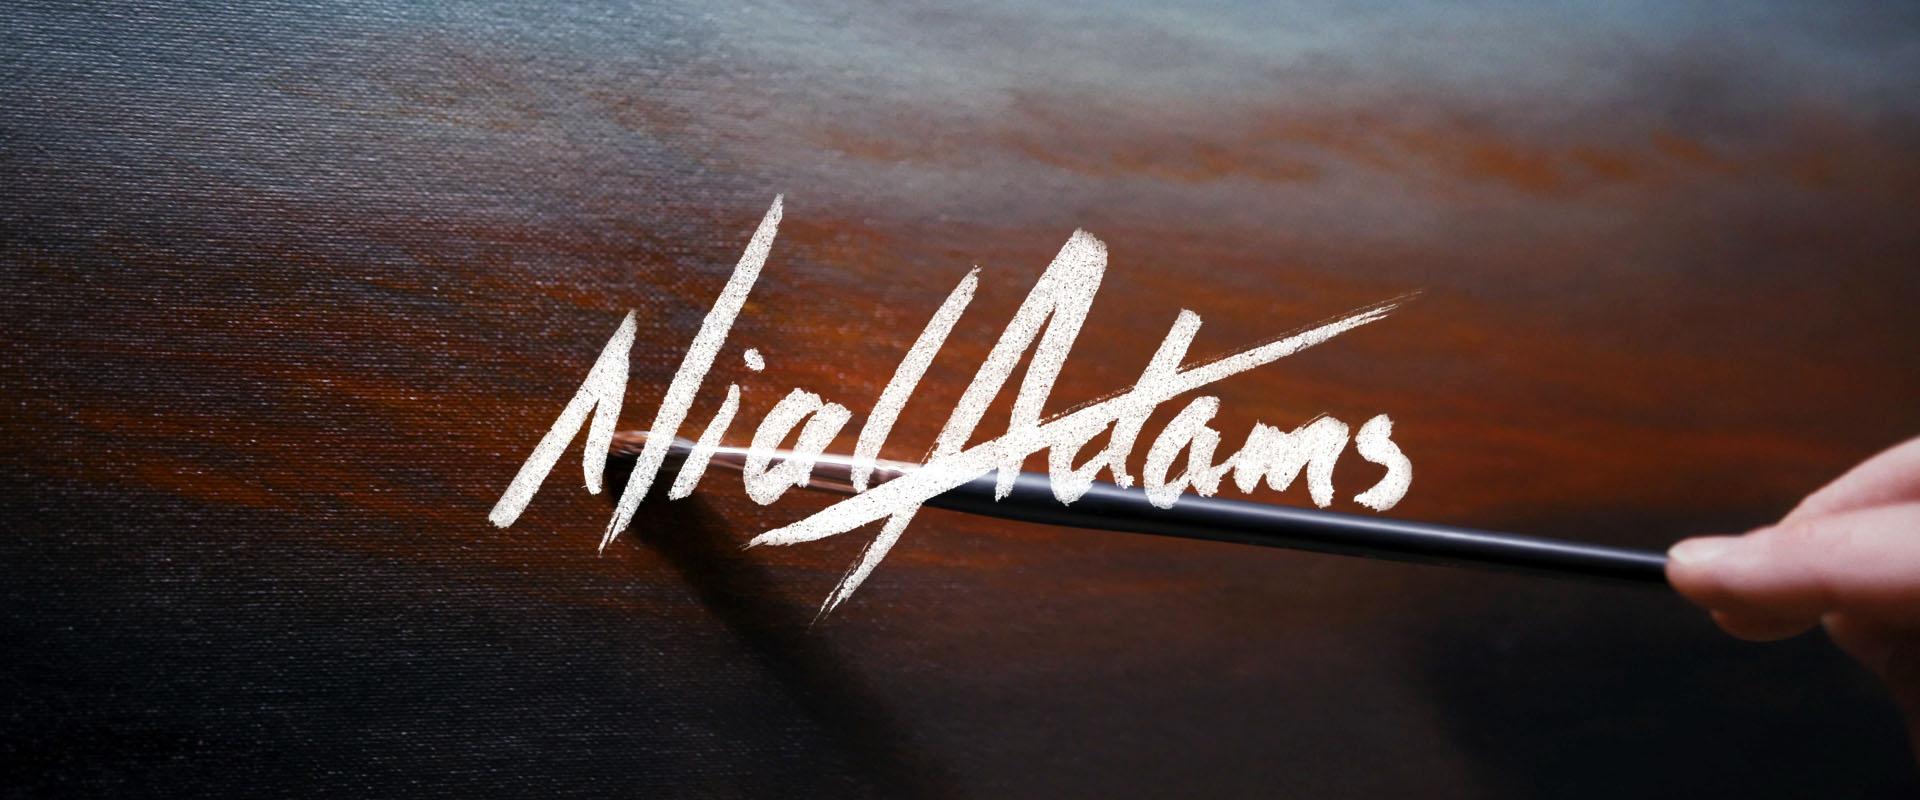 nial adams documentary thumbnail